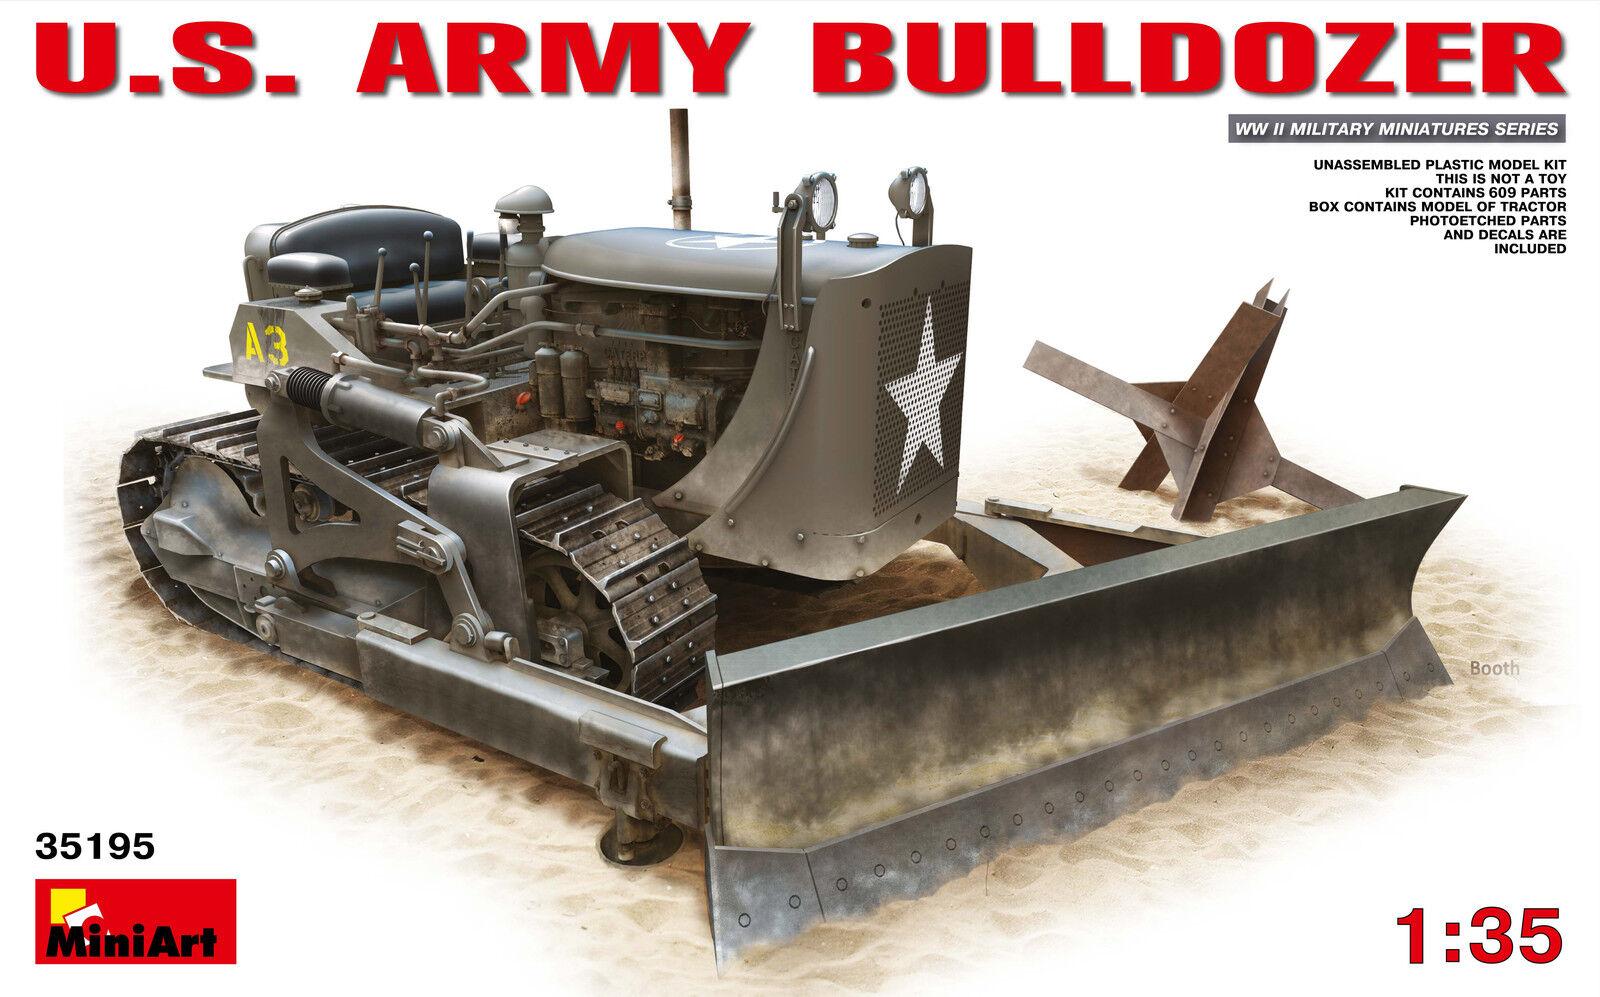 Miniart 1 35 - US Army Bulldozer Plastic Model Kit